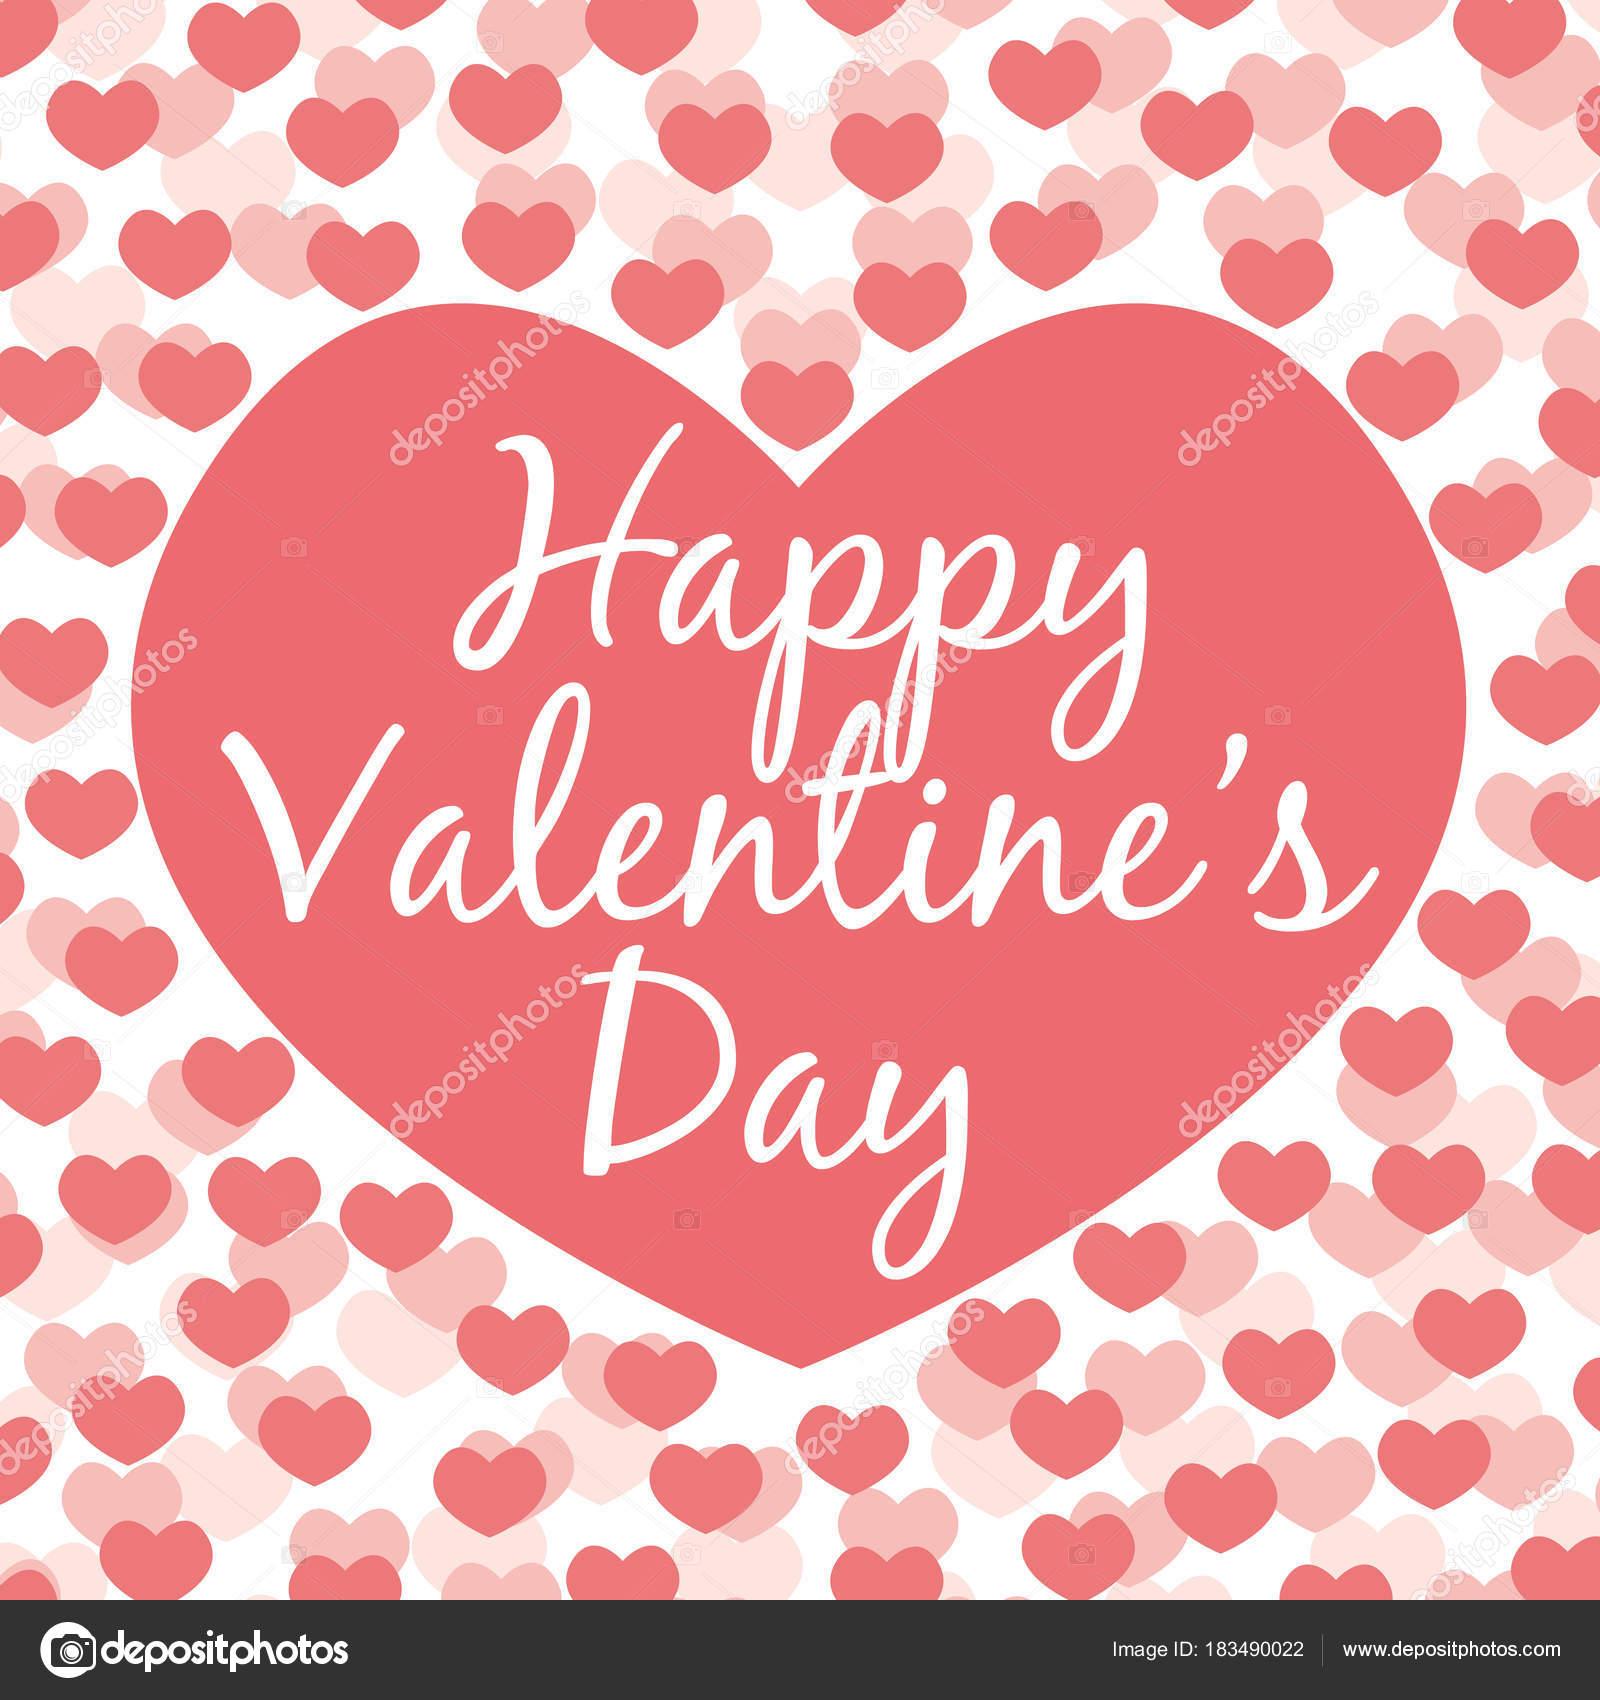 Descargar feliz dia san valentin feliz d a san valent n tarjeta felicitaci n vector tonos - Cartas de san valentin en ingles ...